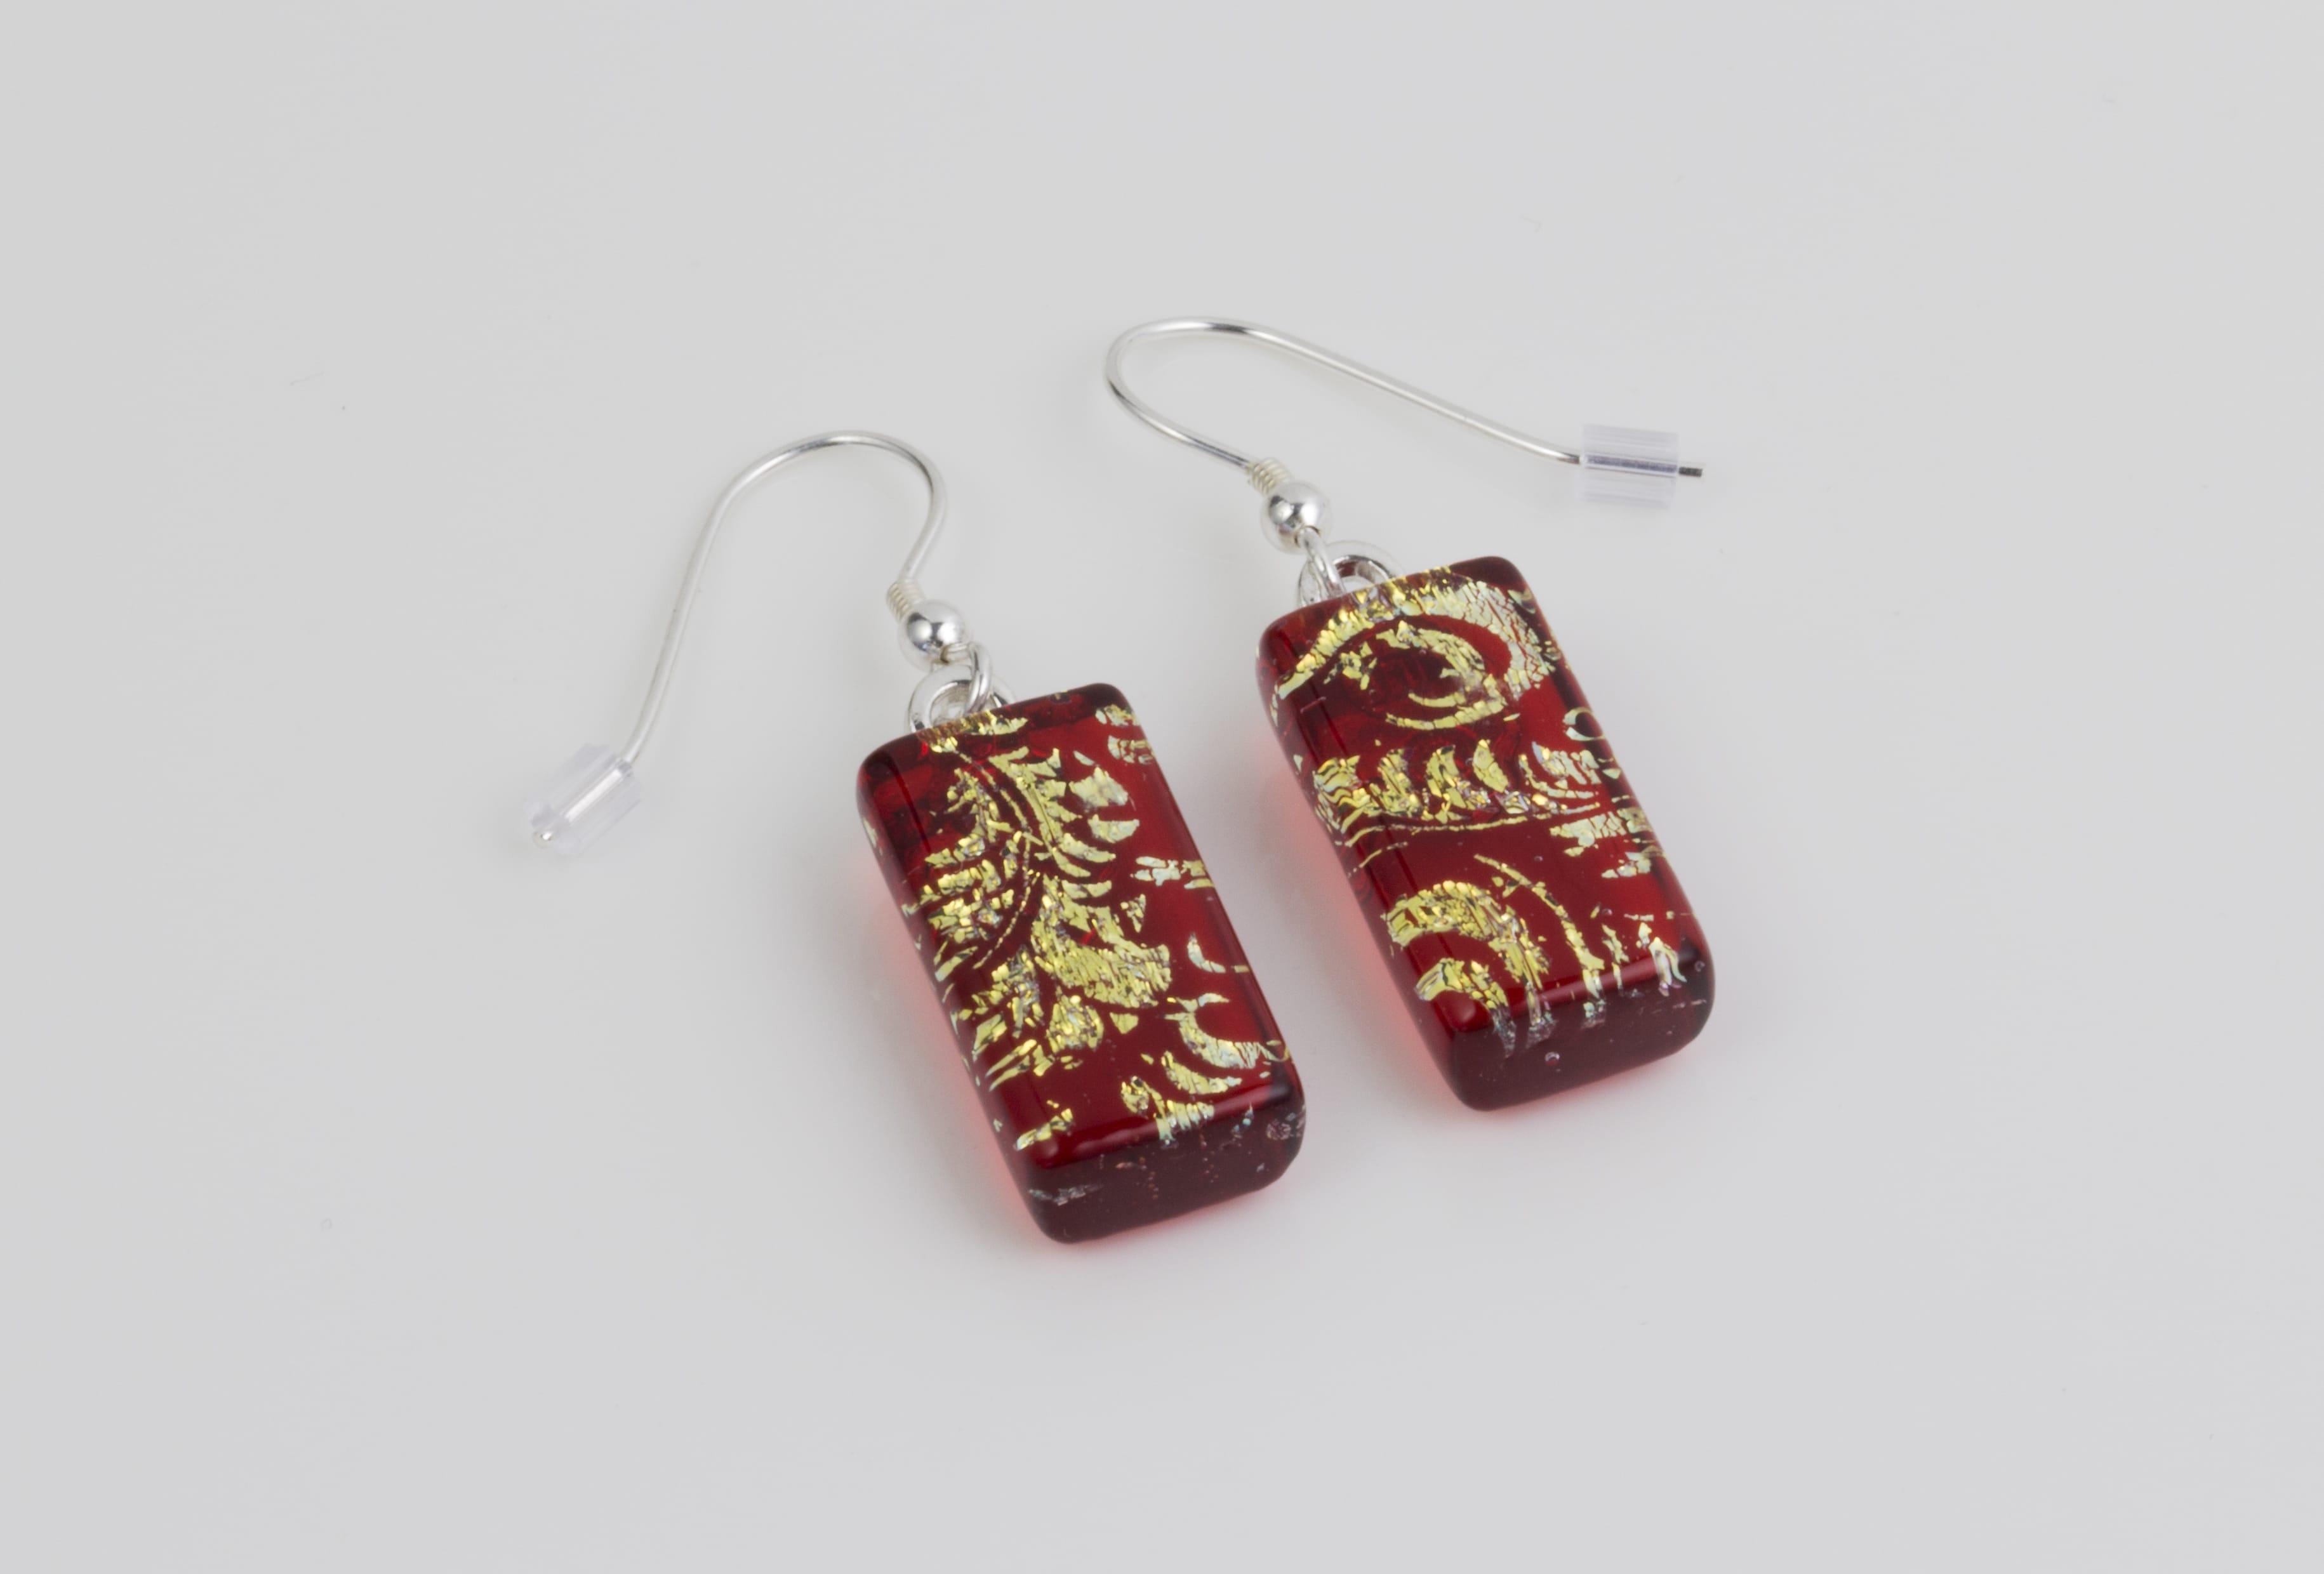 Dichroic glass jewellery uk, glass drop earrings, red earrings with gold plume pattern dichroic glass, art glass earrings handmade in Shropshire, sterling silver hooks